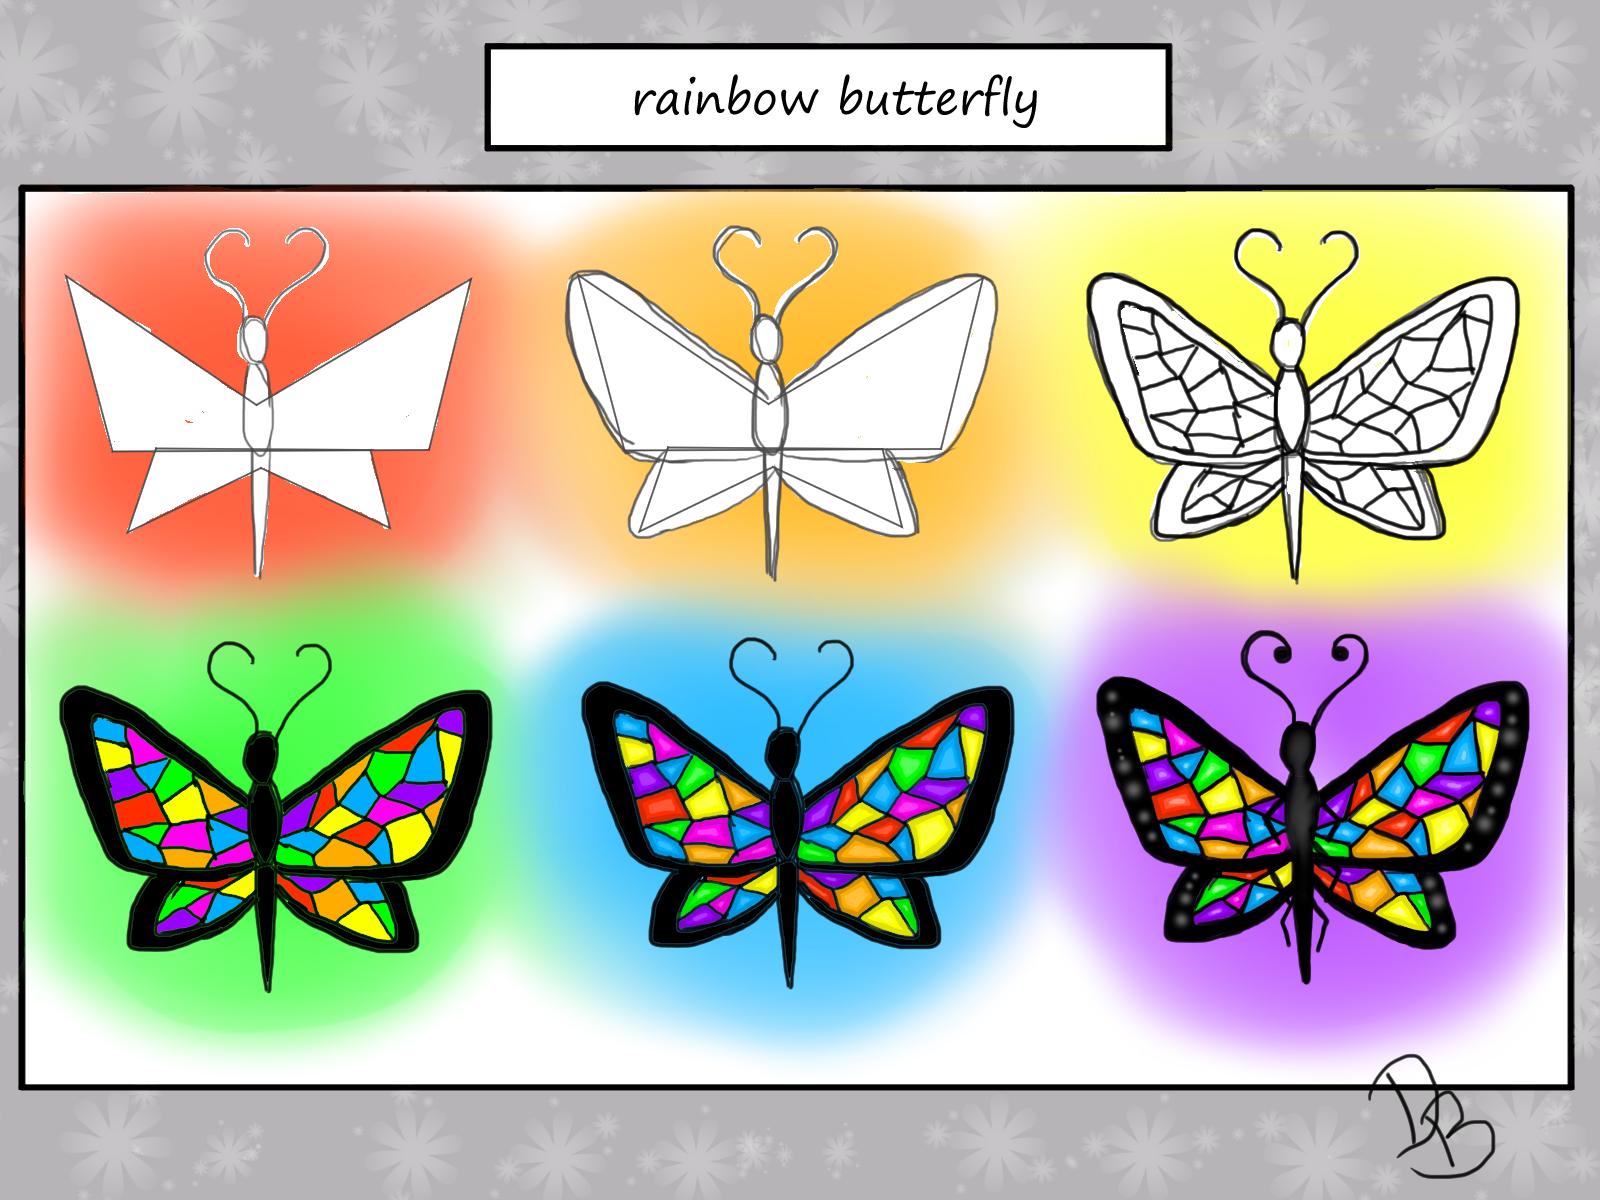 Process rainbow butterfly